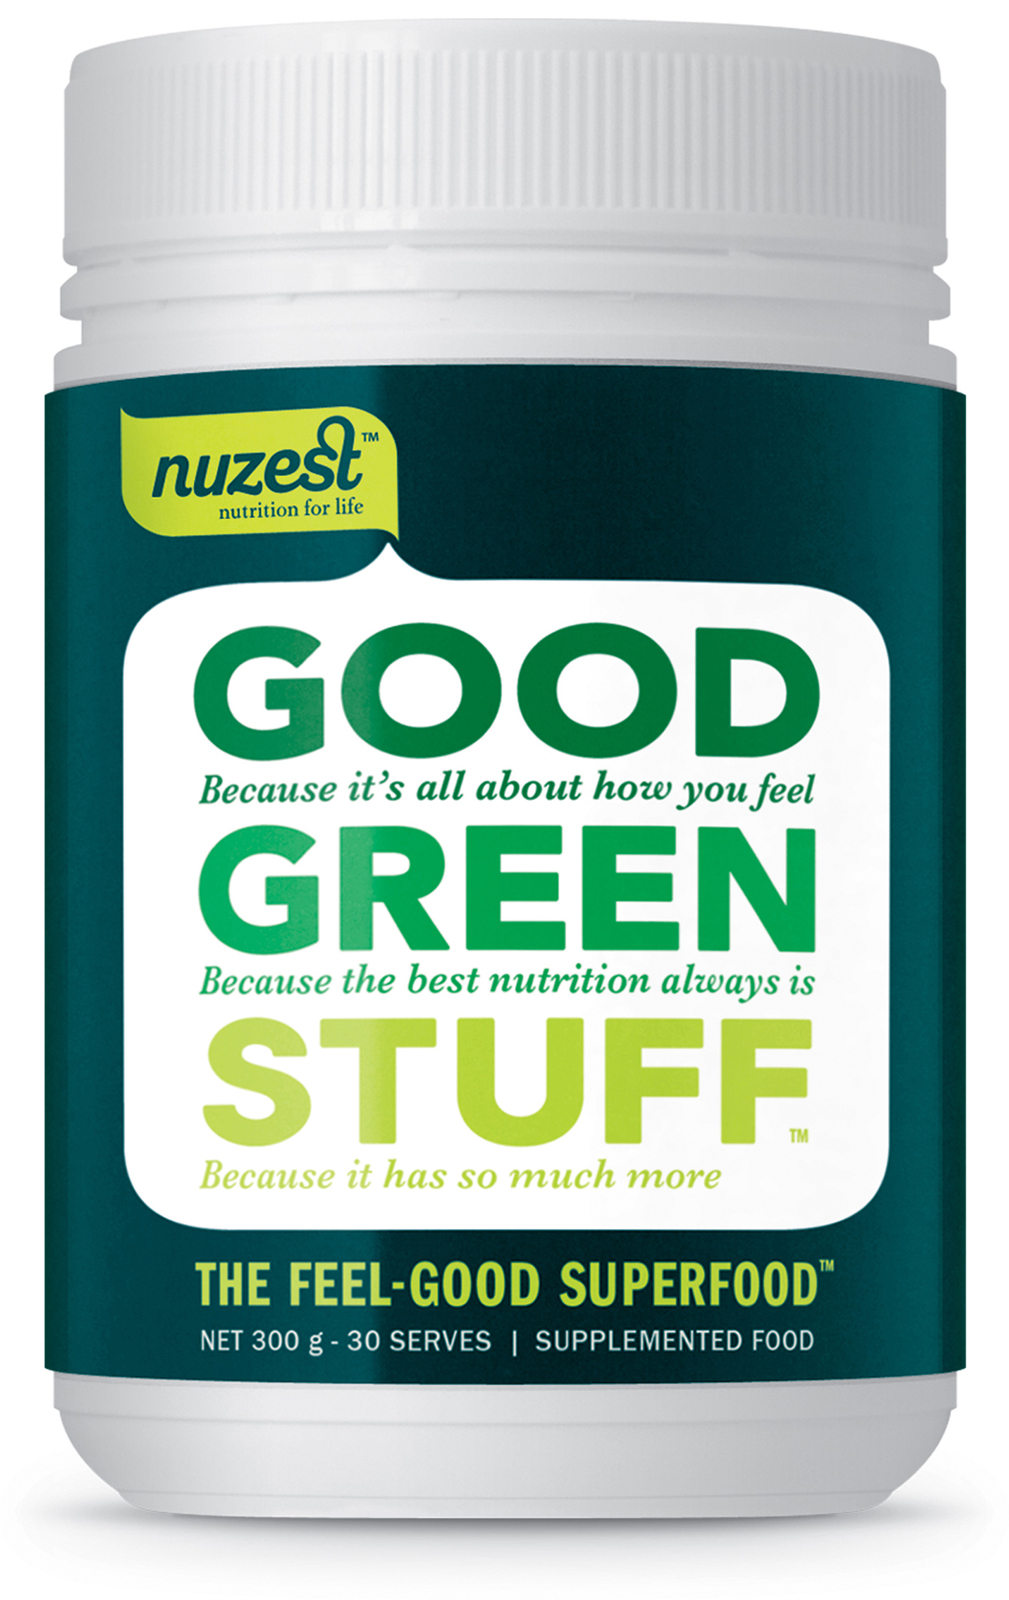 Good Green Stuff - 300g Jar image